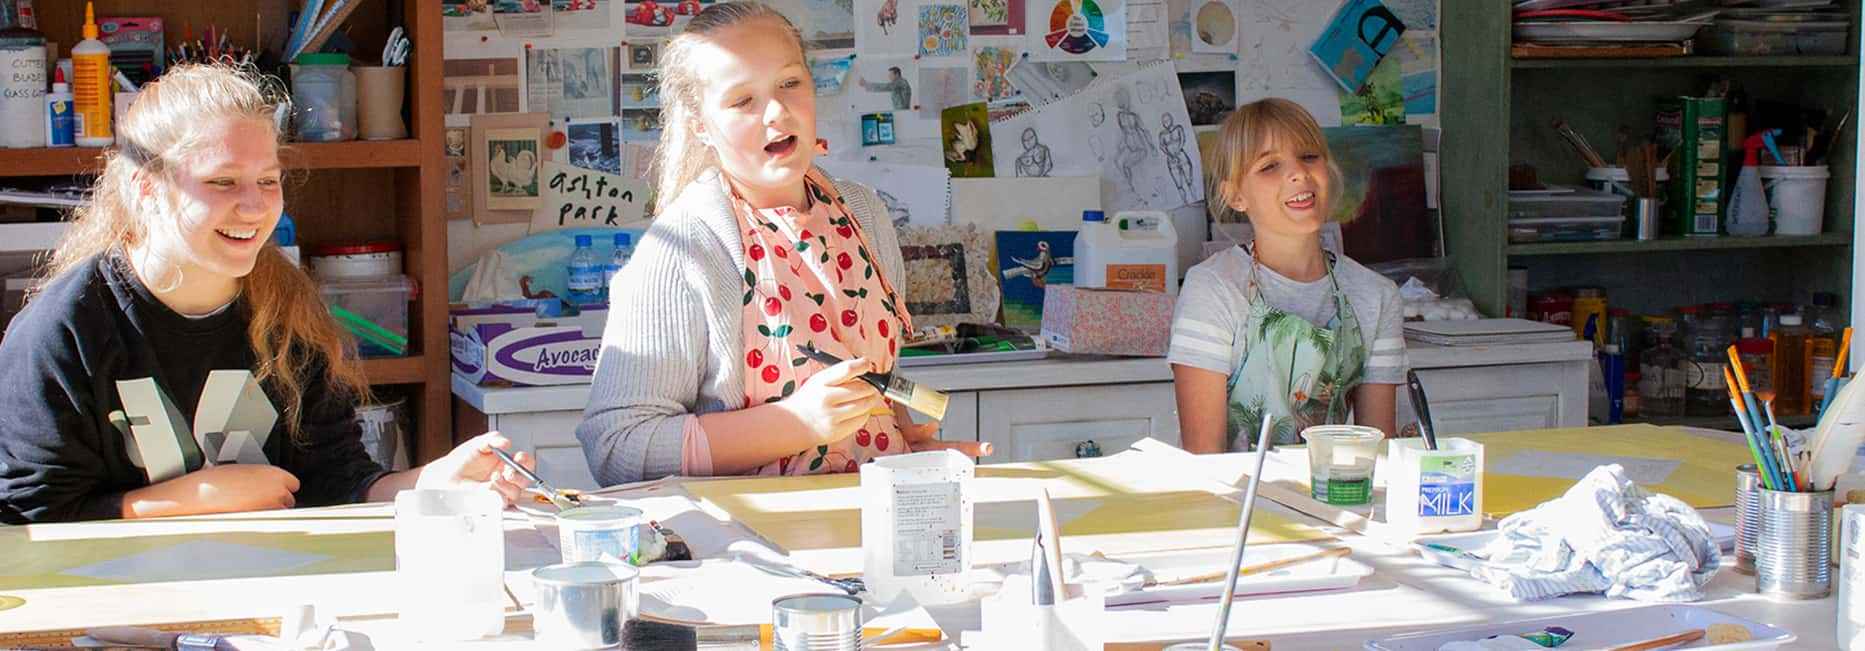 Kids enjoying art workshop at Ashton Park